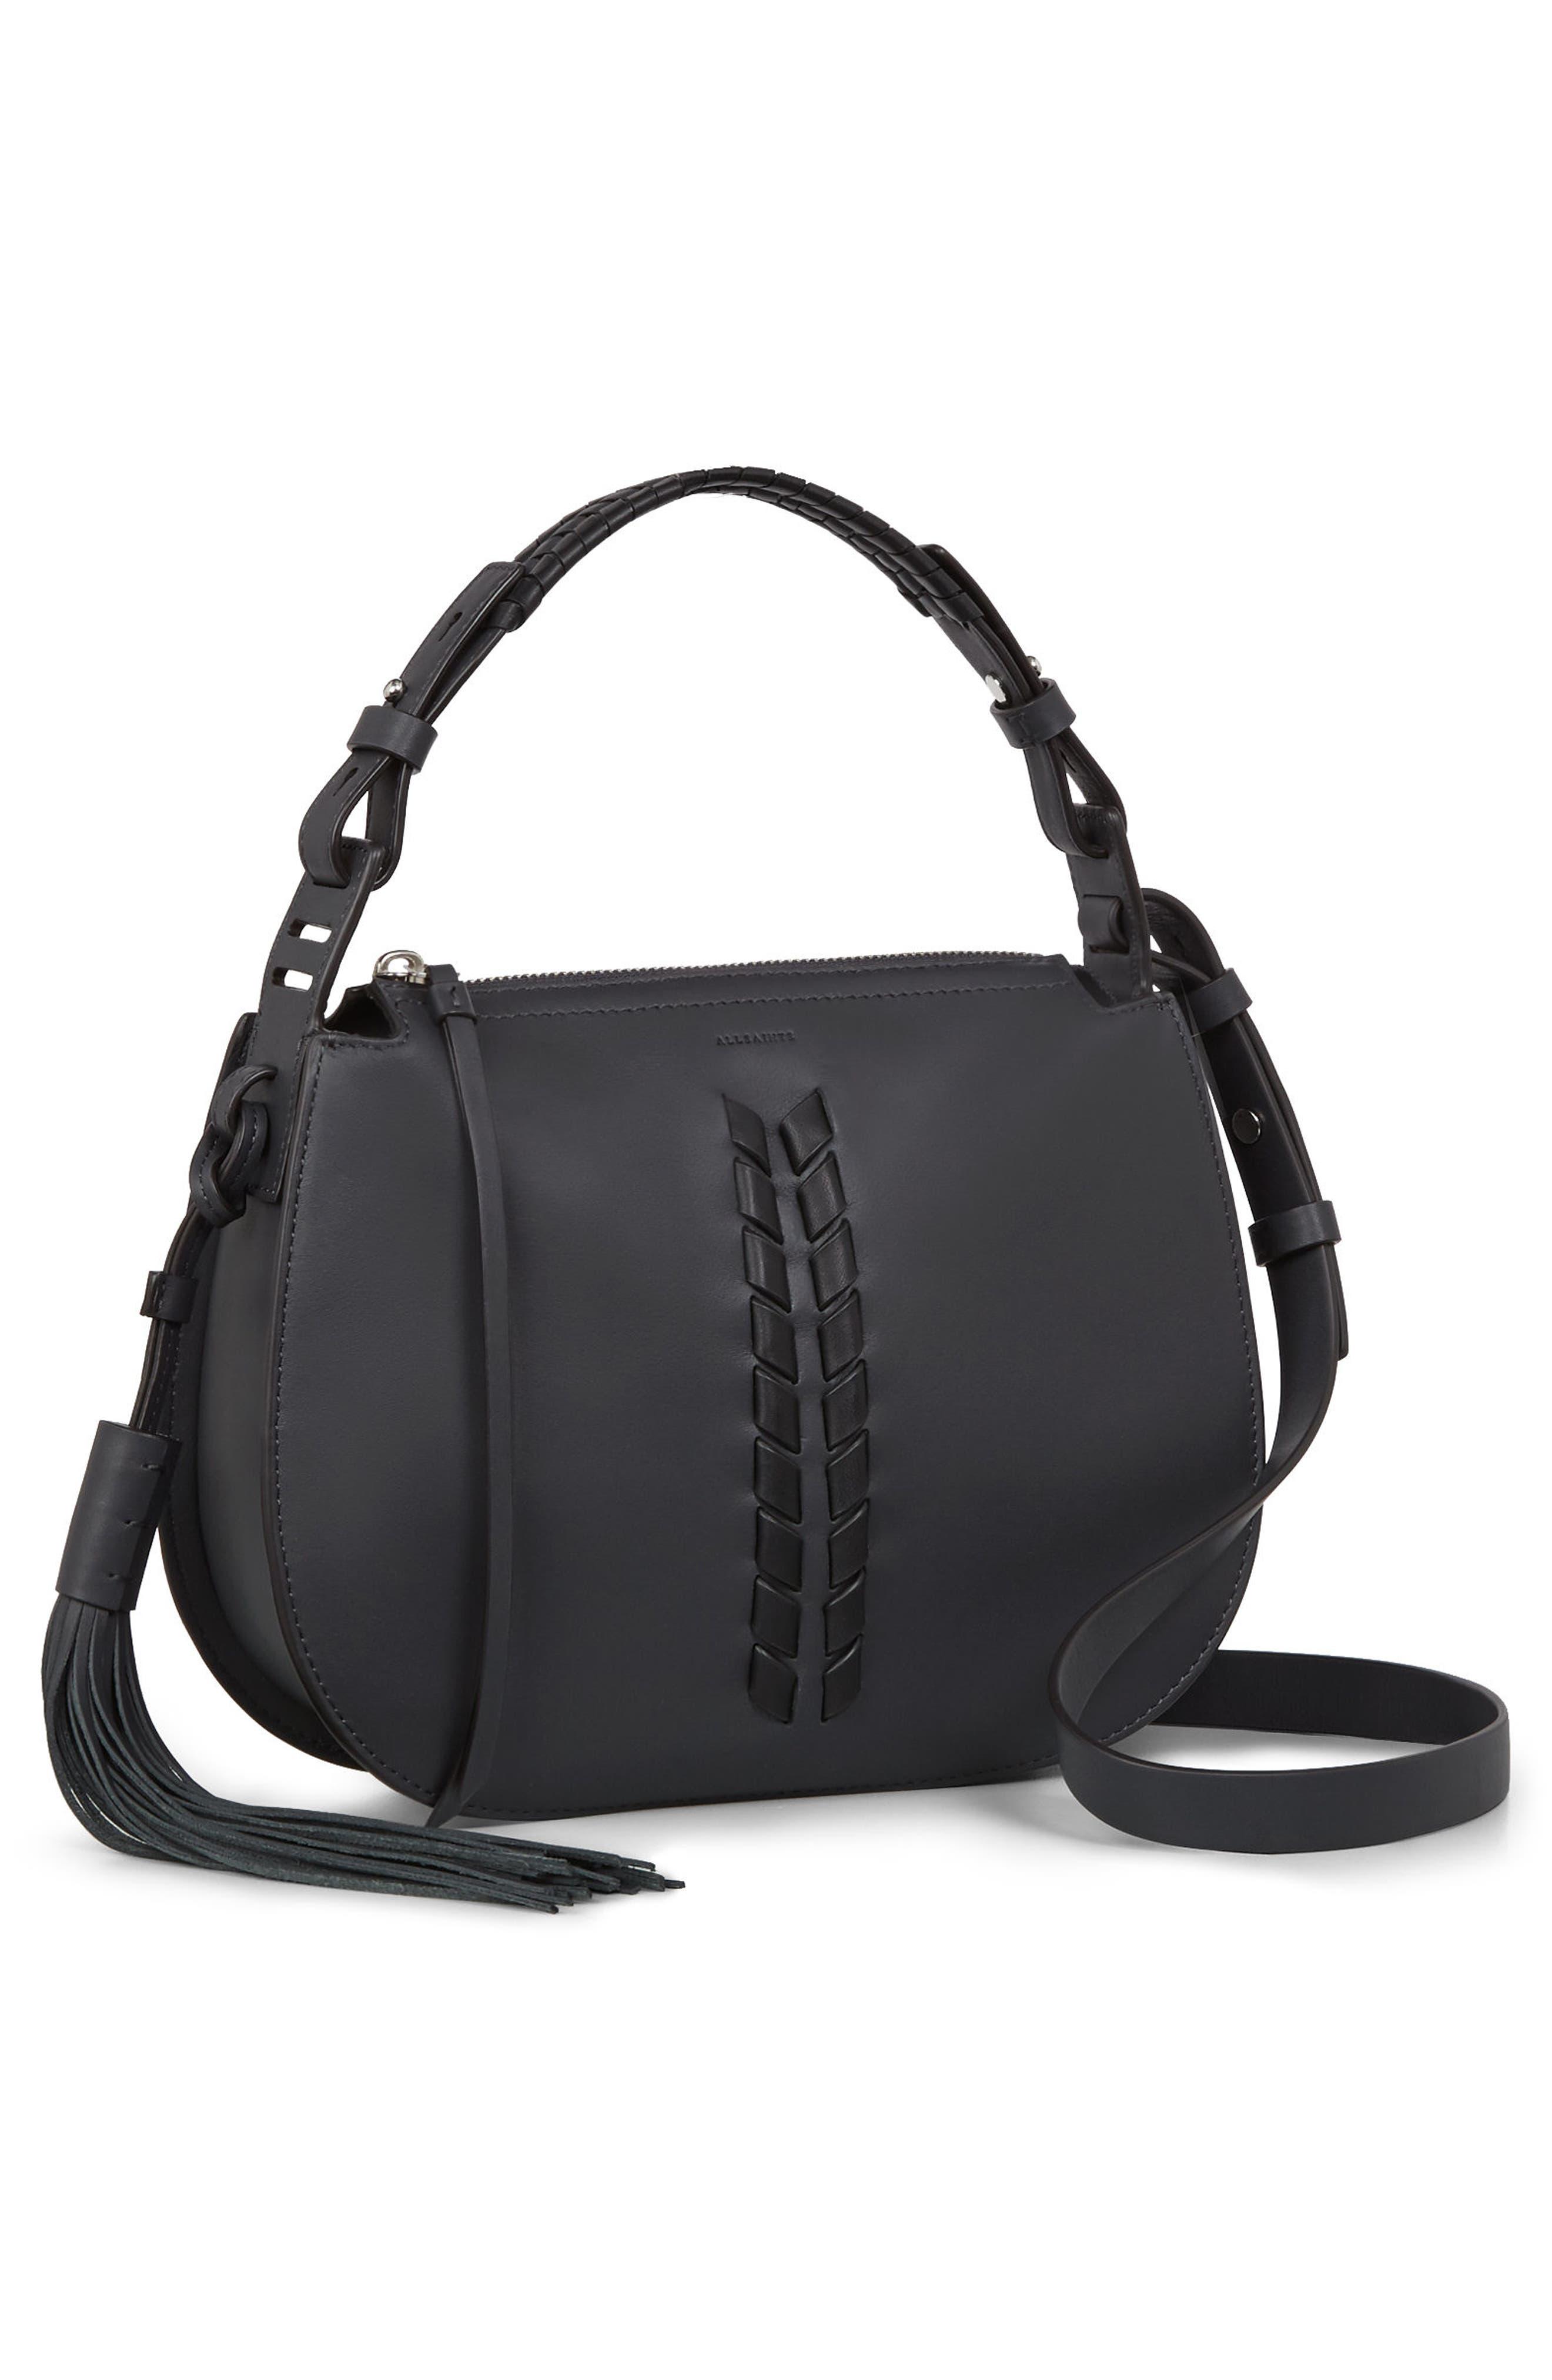 Kepi Leather Crossbody Bag,                             Alternate thumbnail 6, color,                             Navy Black